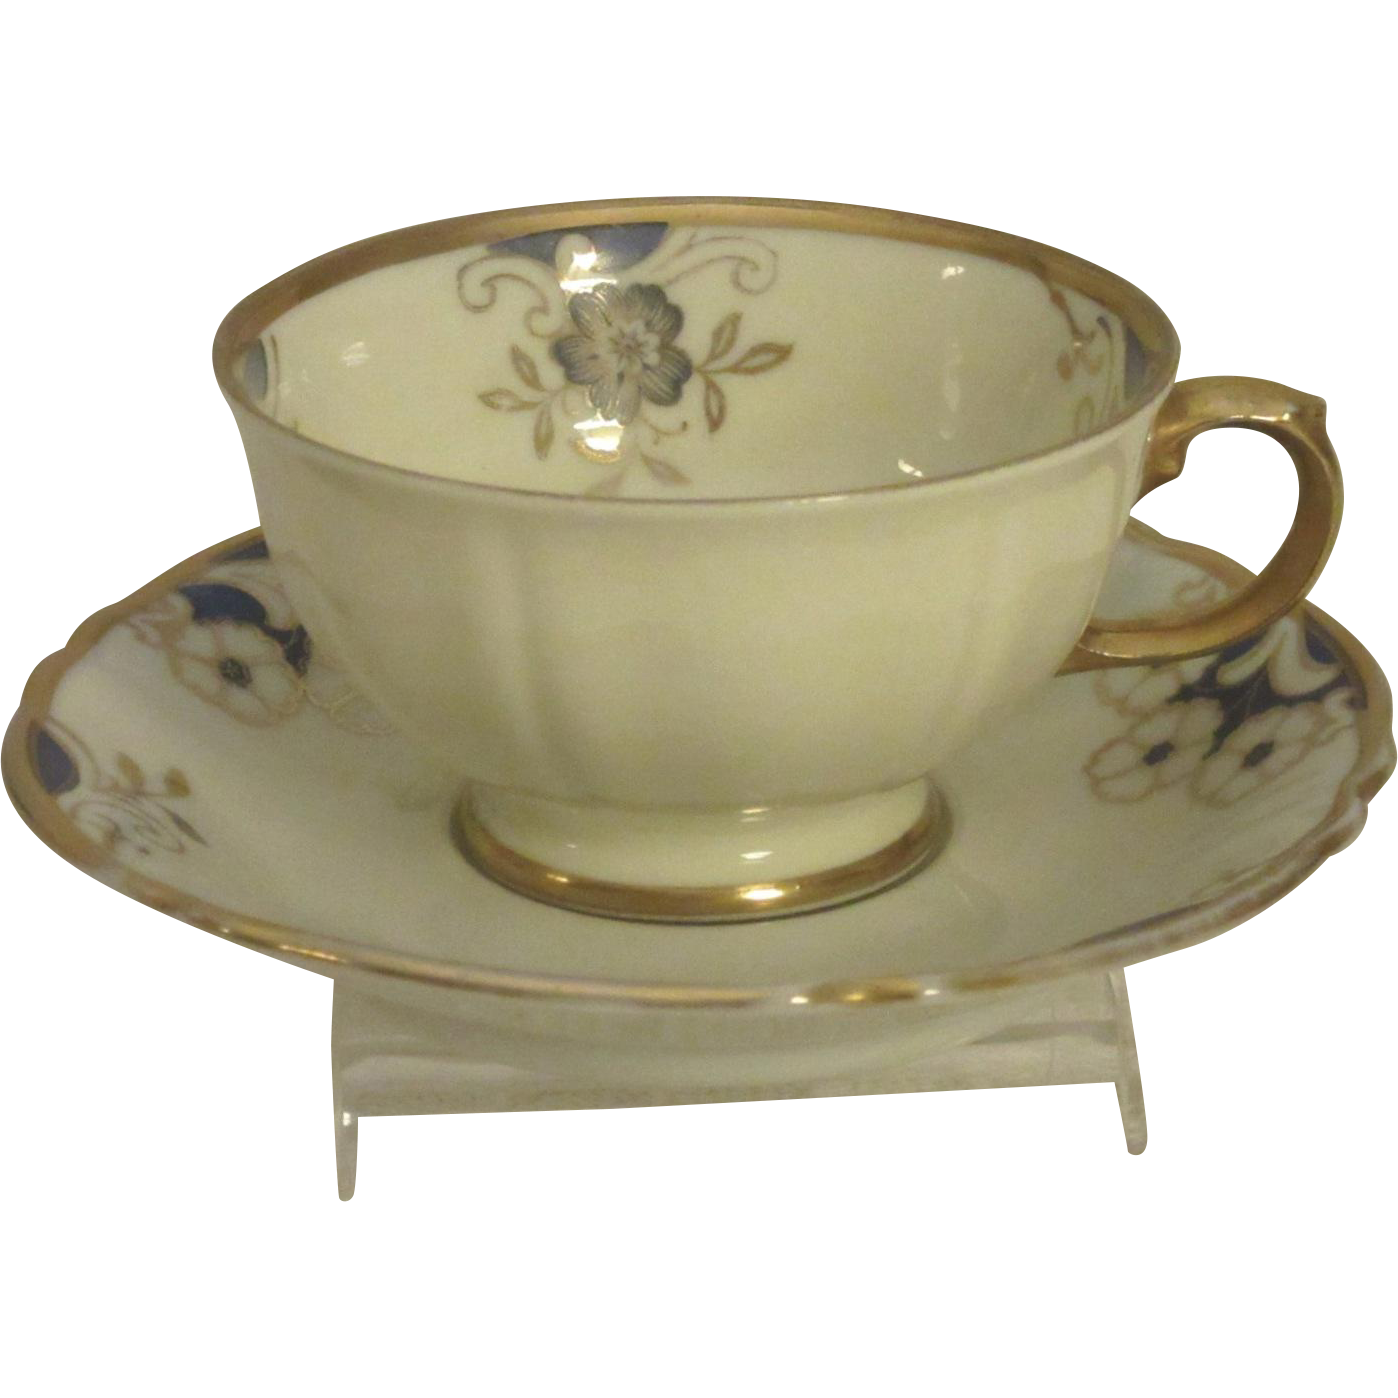 Lovely Demitasse Set, Eschenbach, Bavarian Porcelain